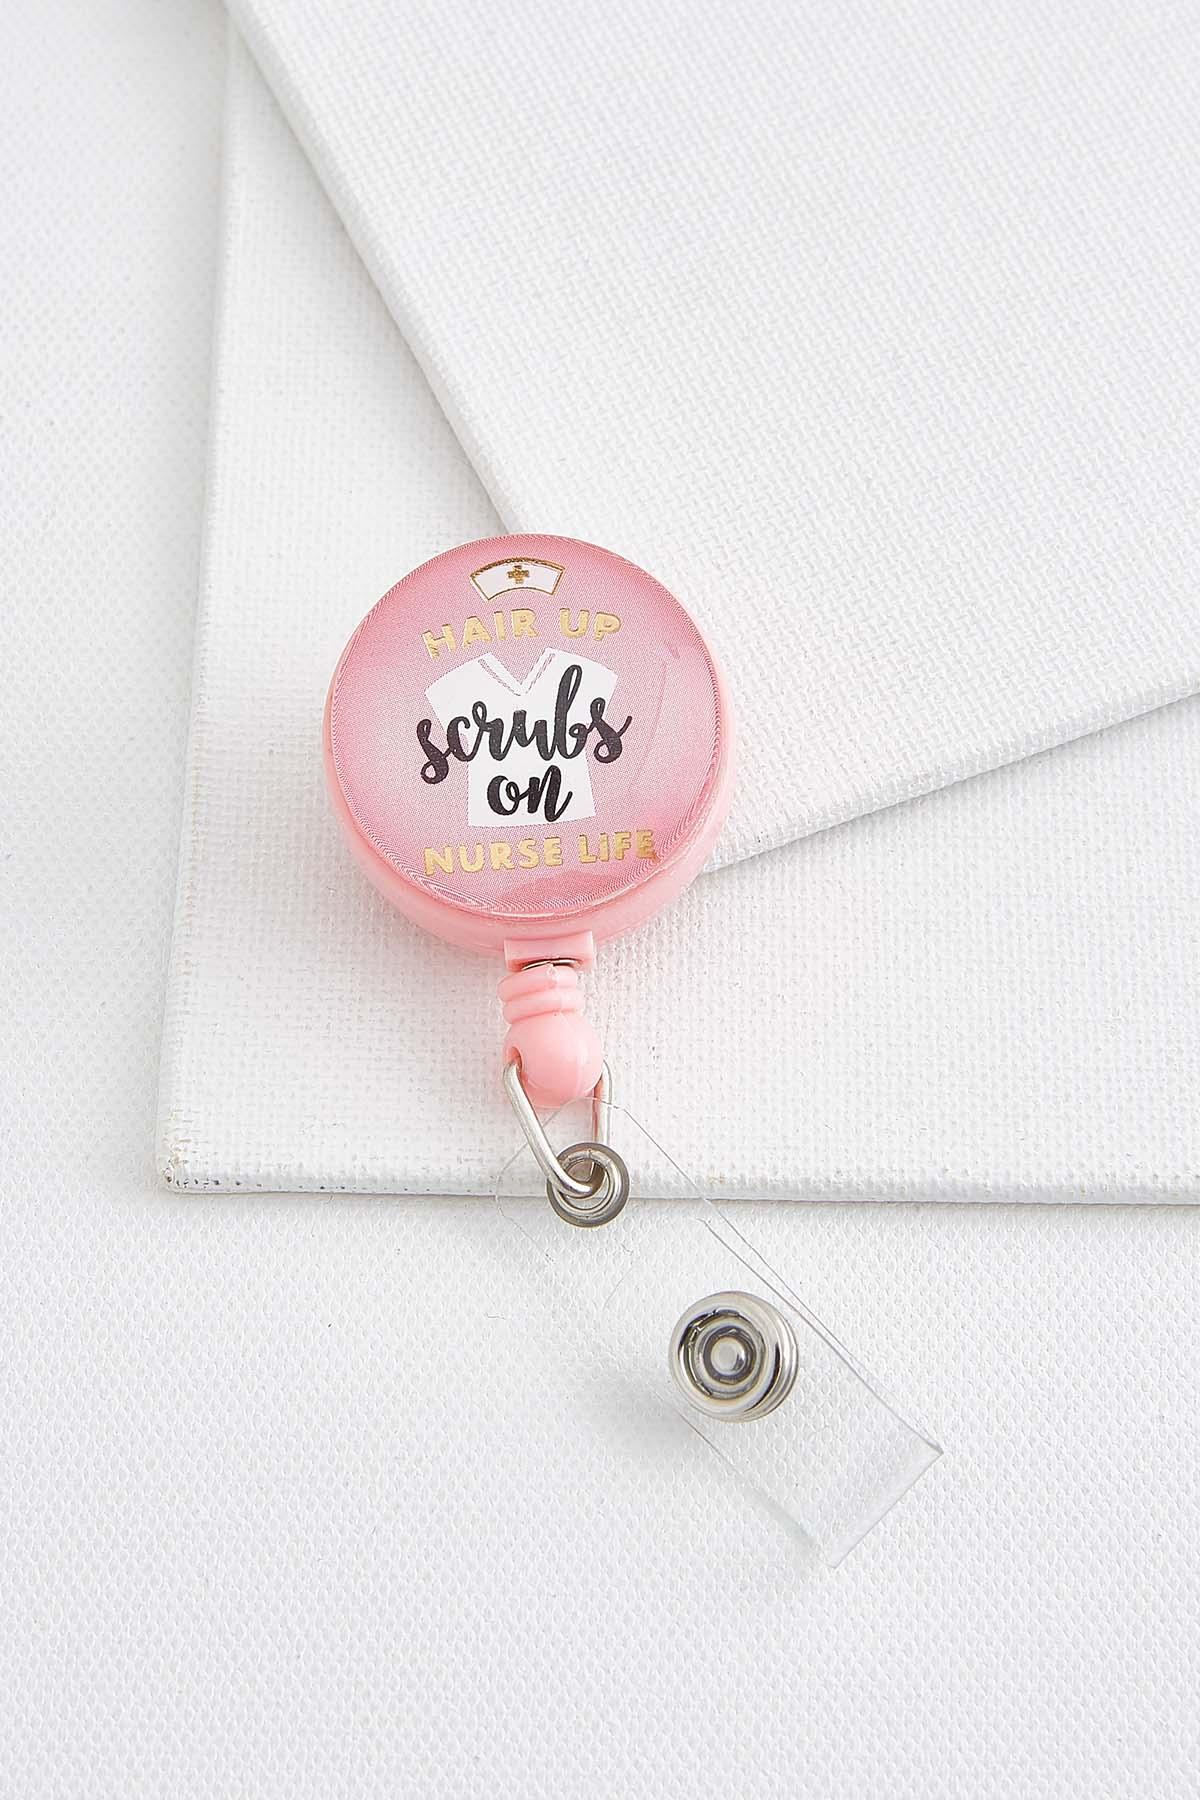 Nurse Life Badge Reel